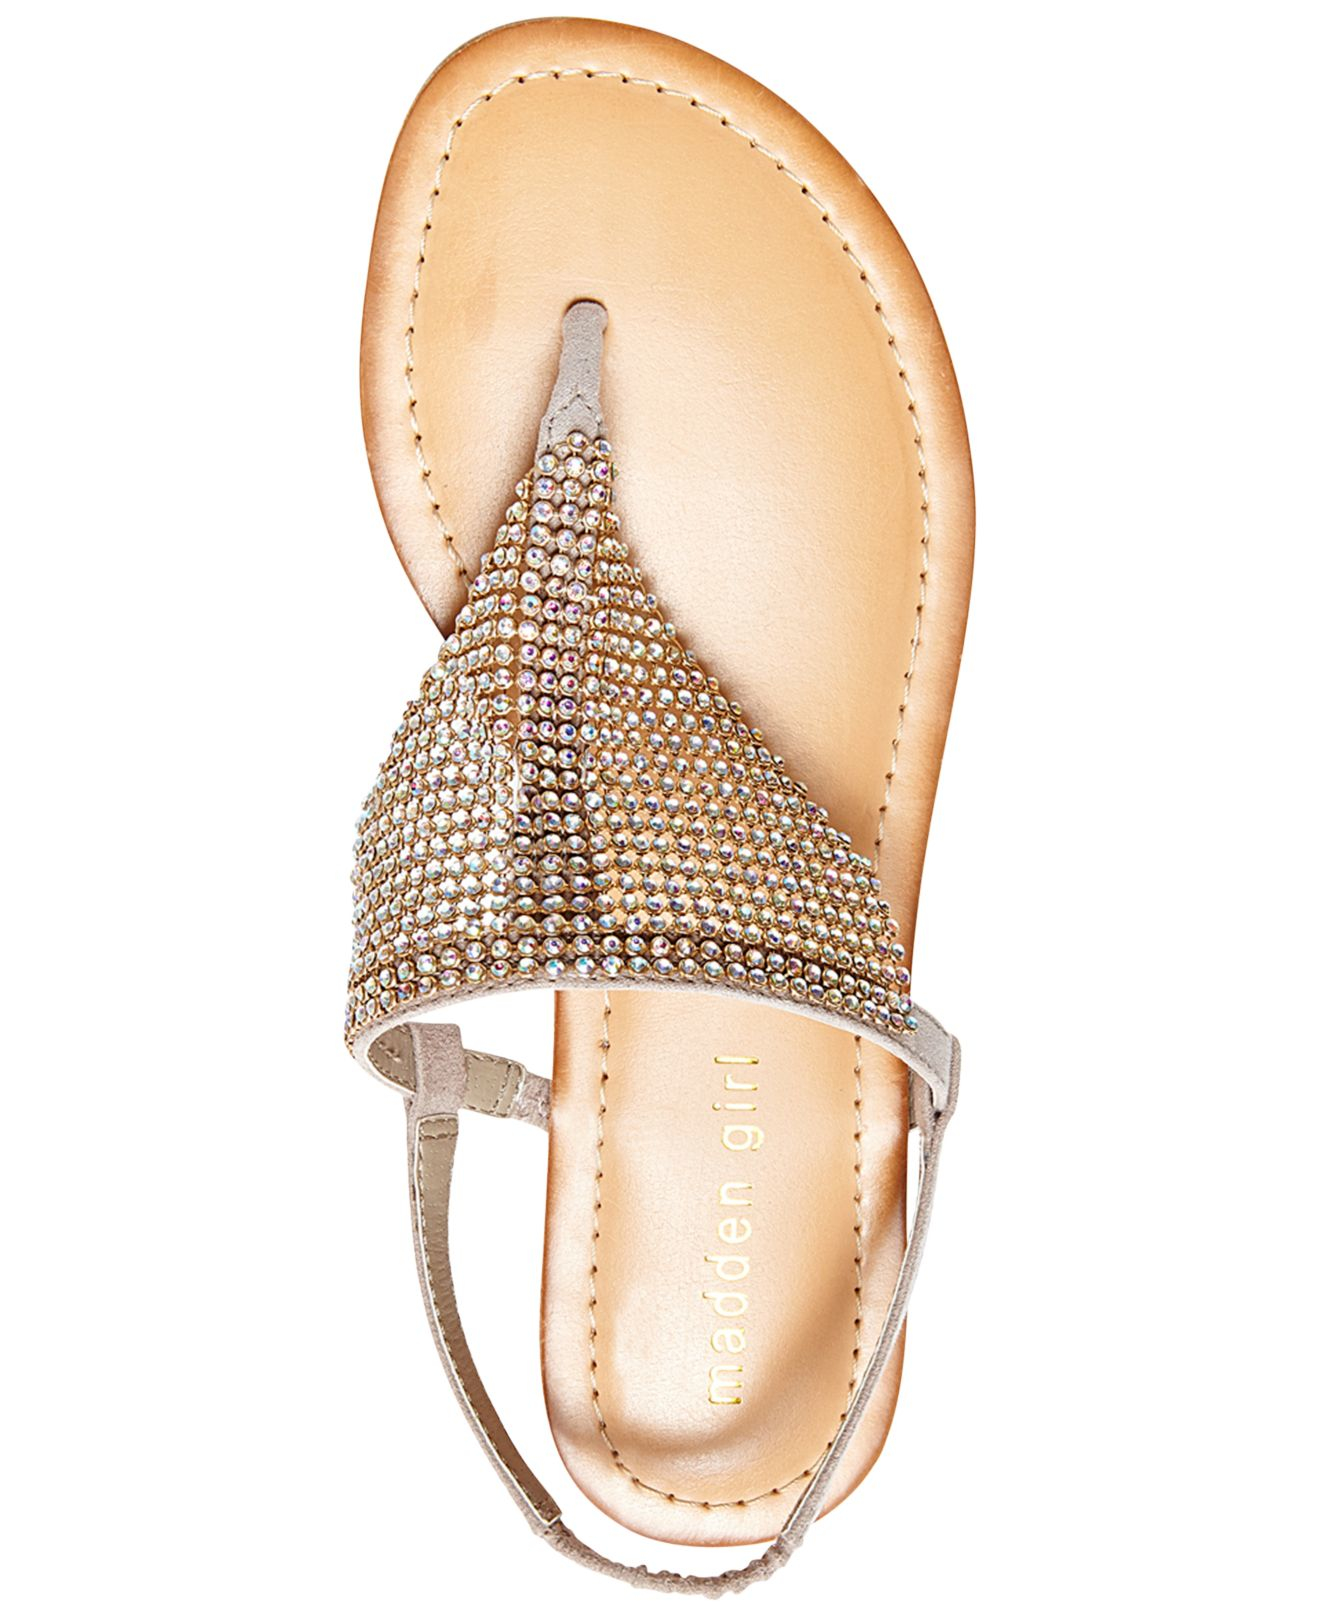 1431331e5c7 Madden Girl Natural Sandie Rhinestone Hooded Flat Thong Sandals